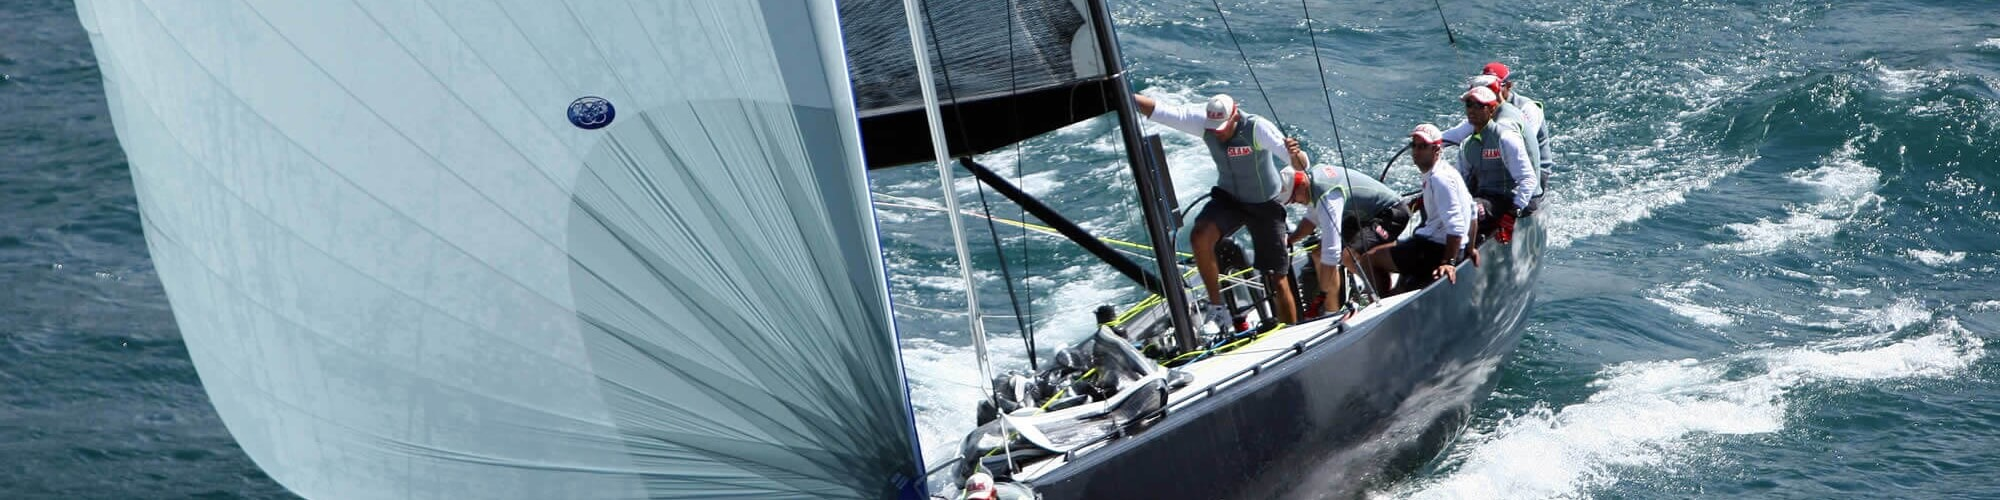 Olimpic Sails Professional Sails